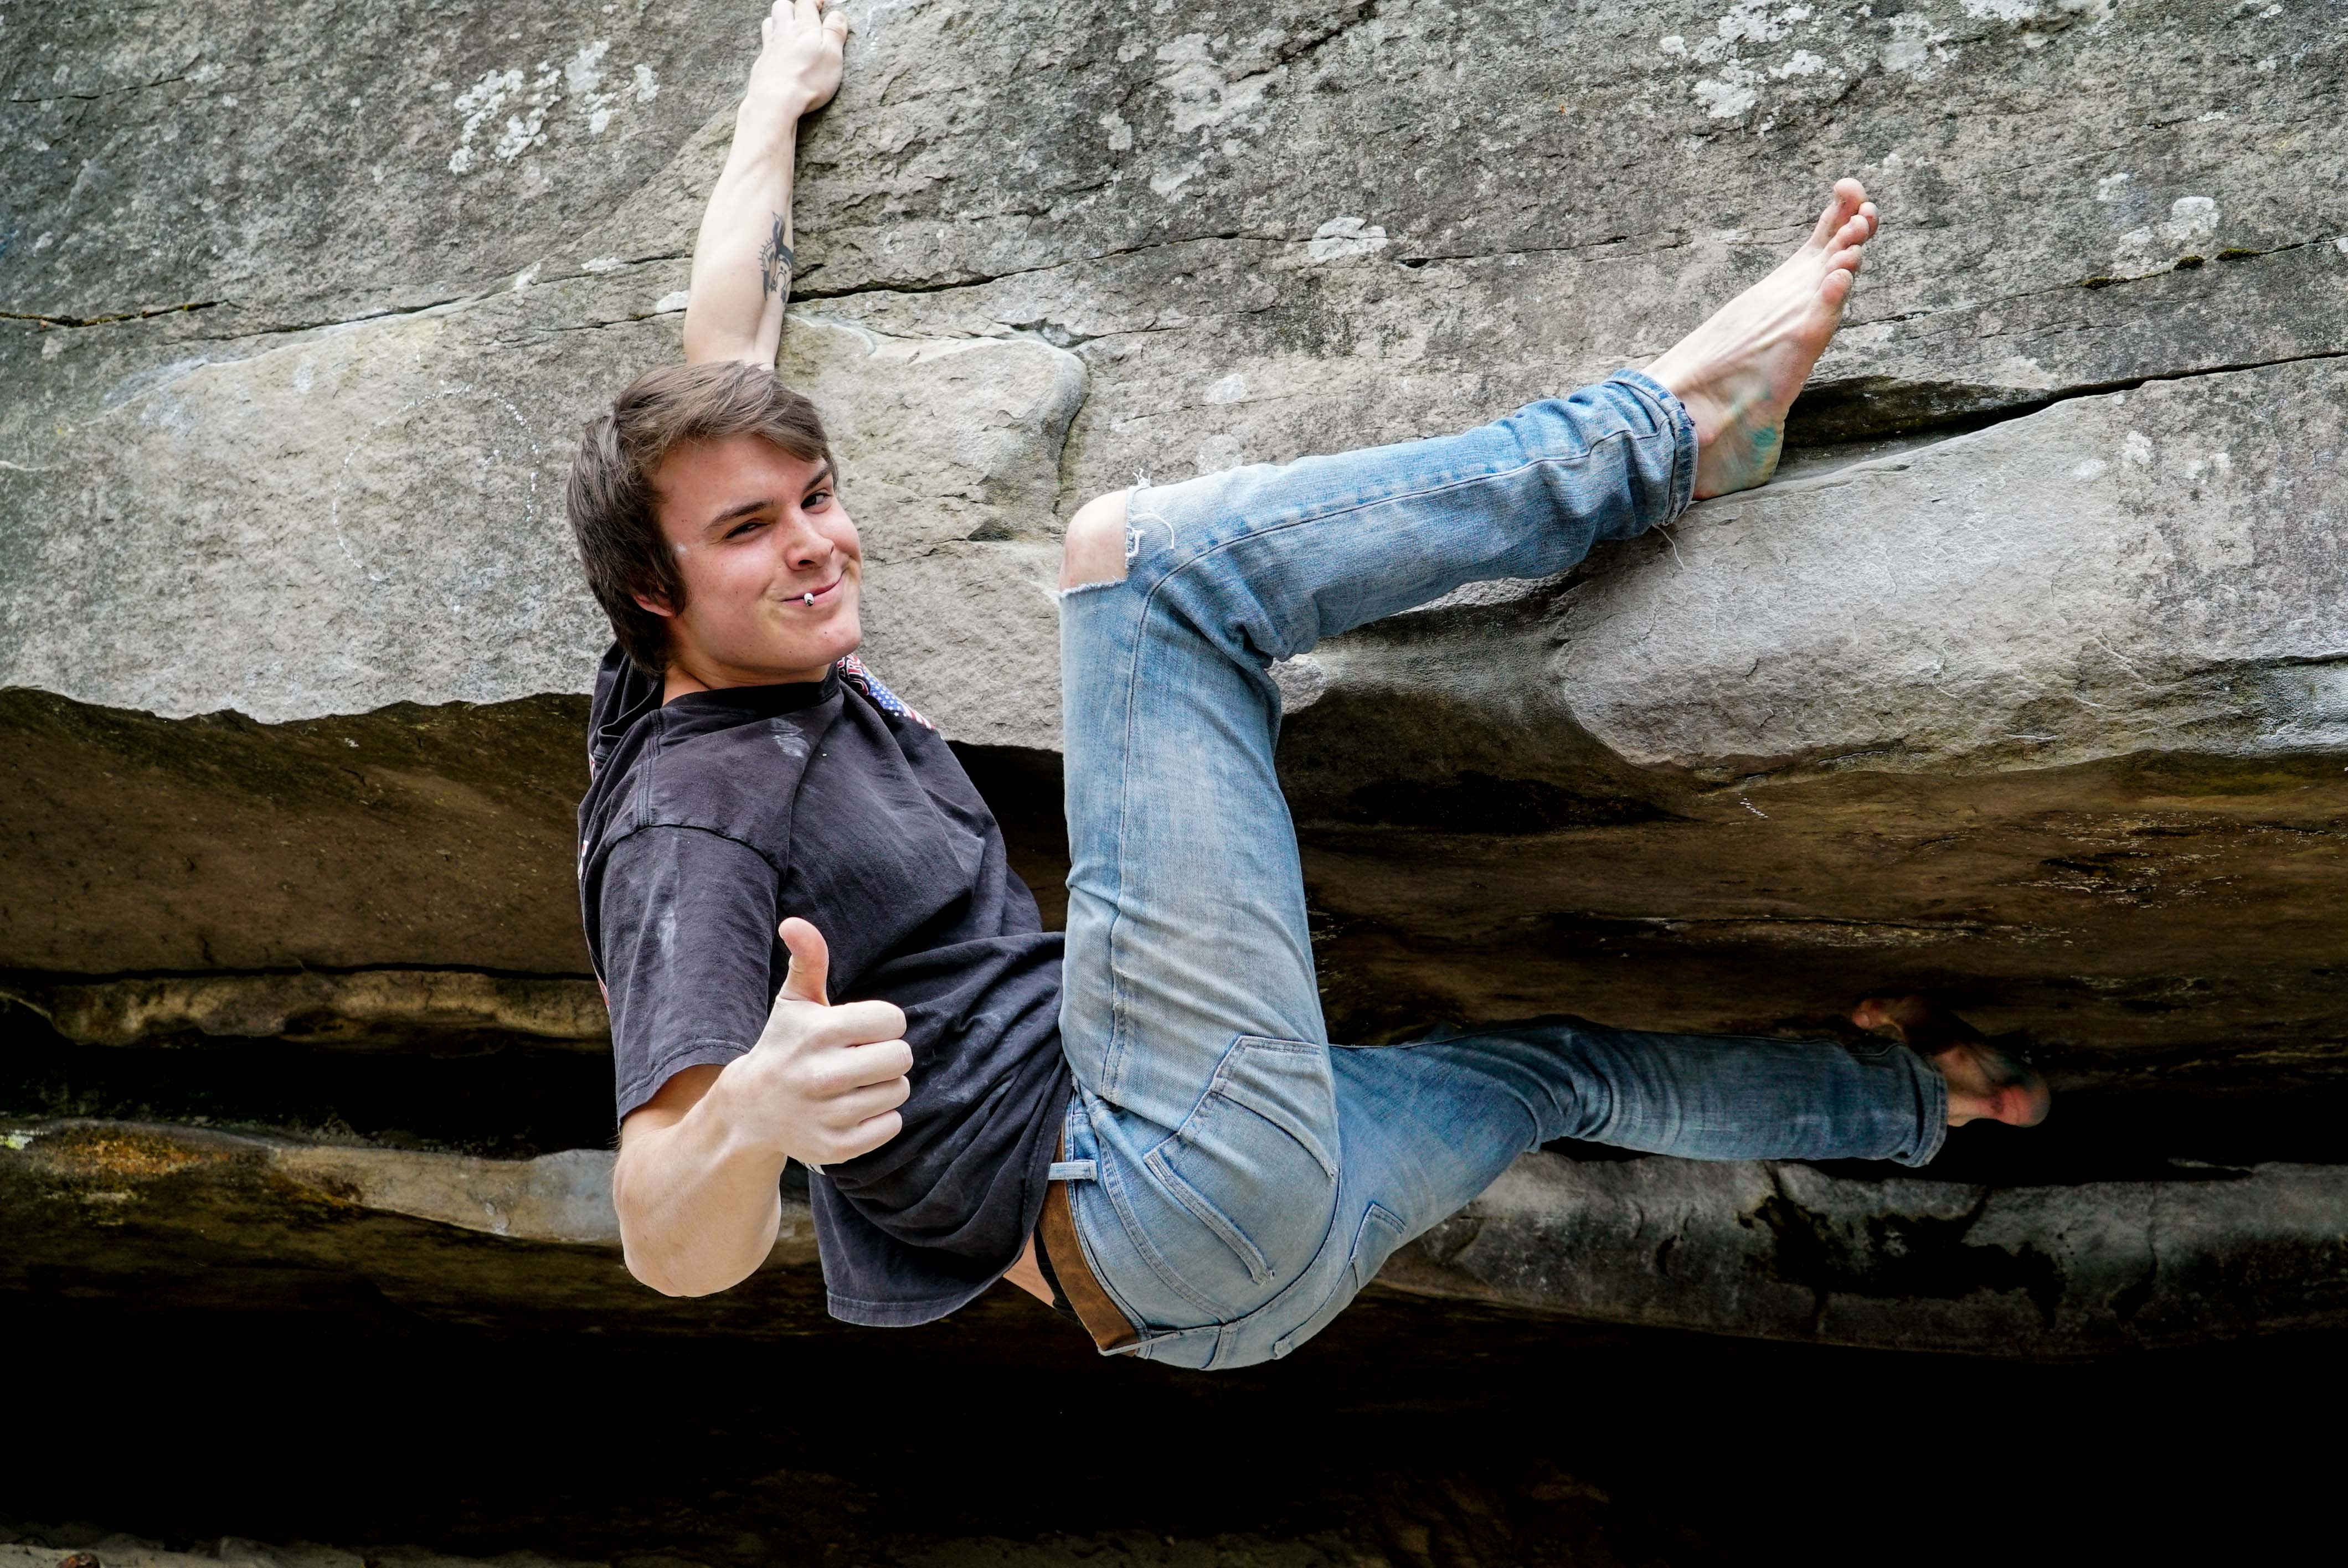 fontainbleau climbing 2016 mike brindley-6